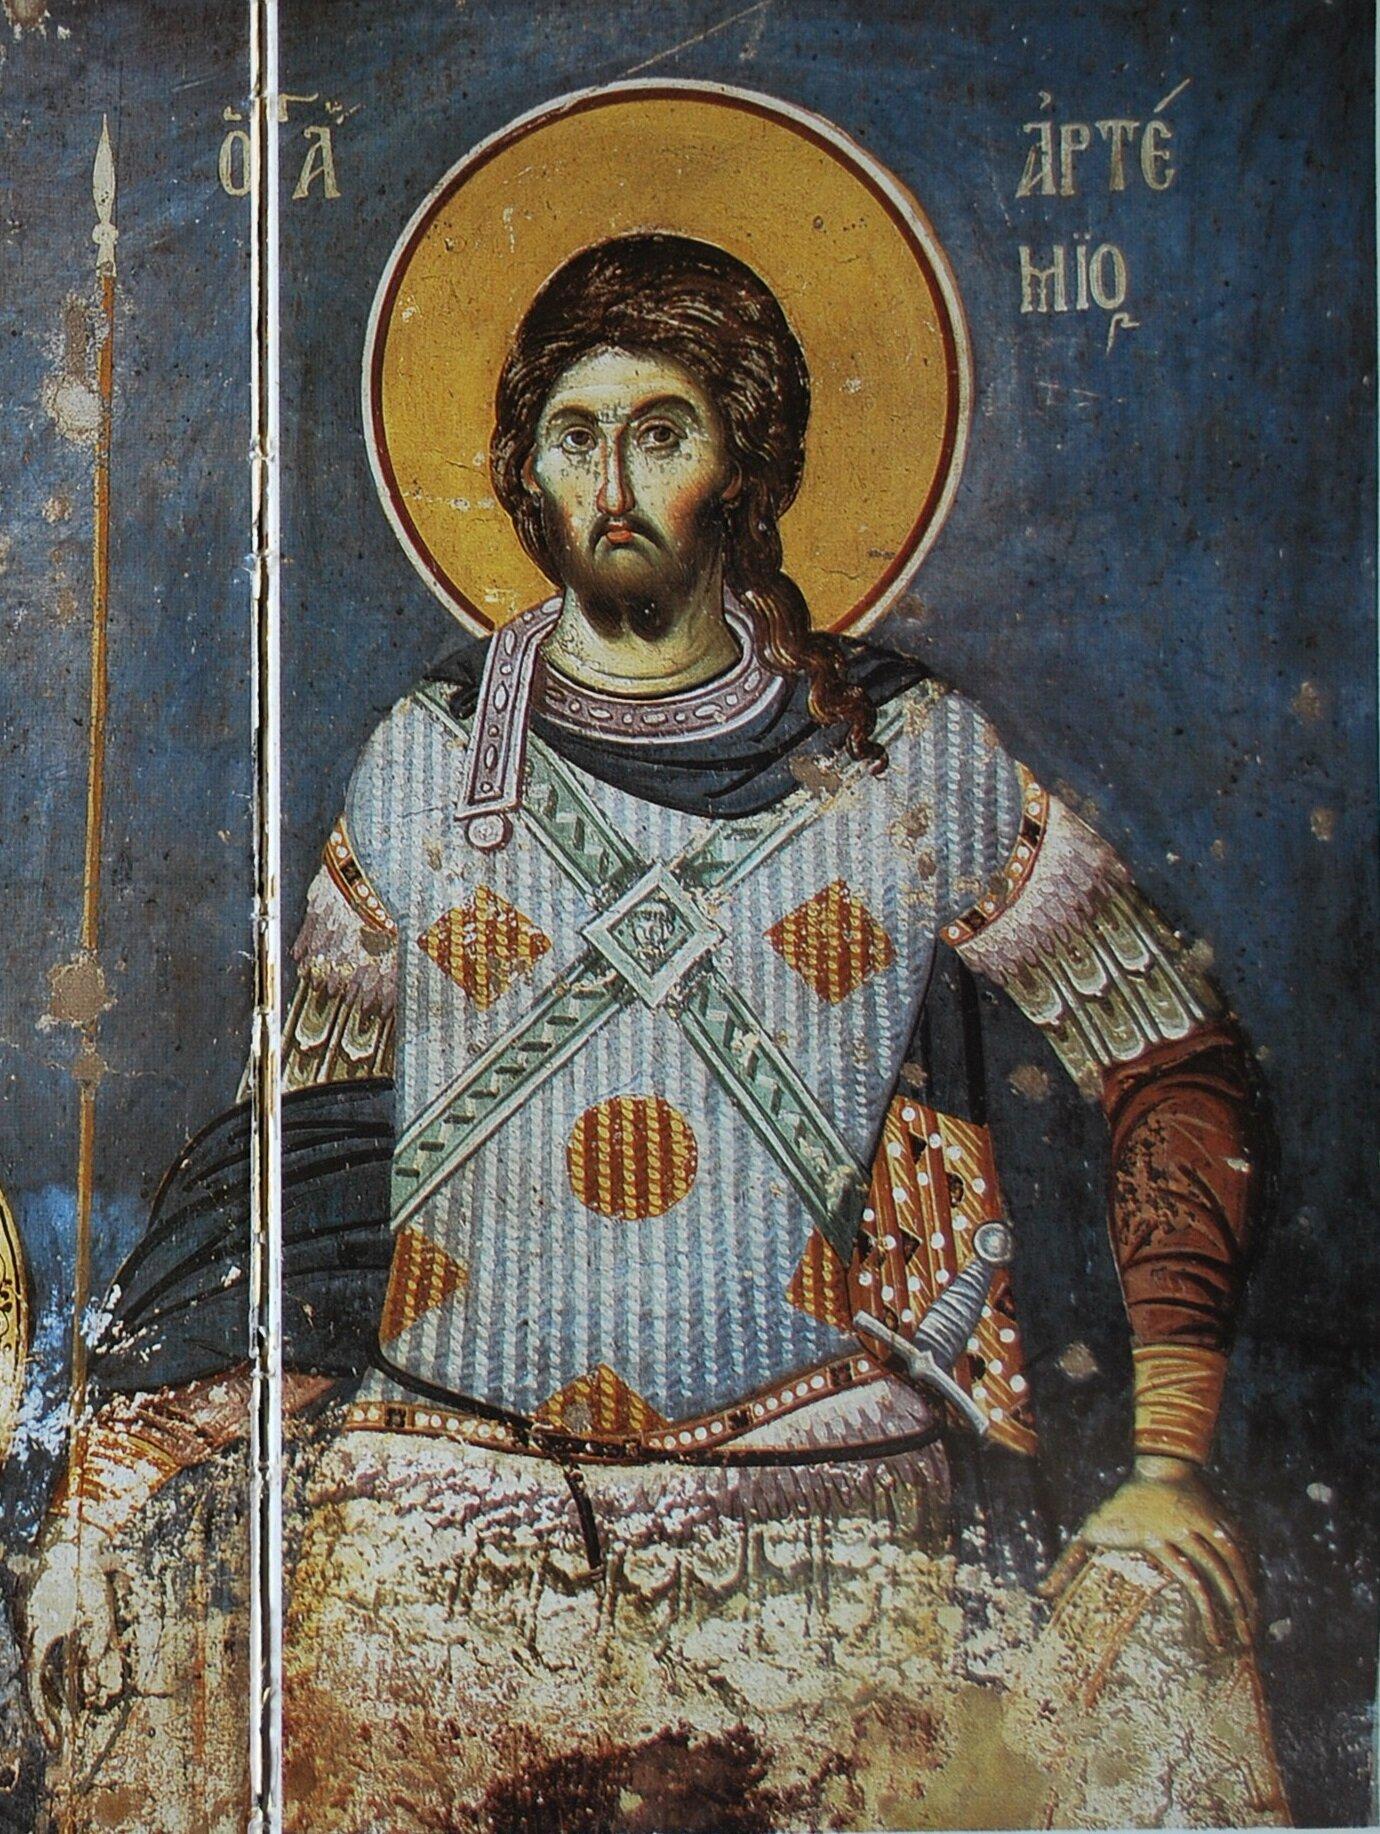 St. Artemios the Martyr